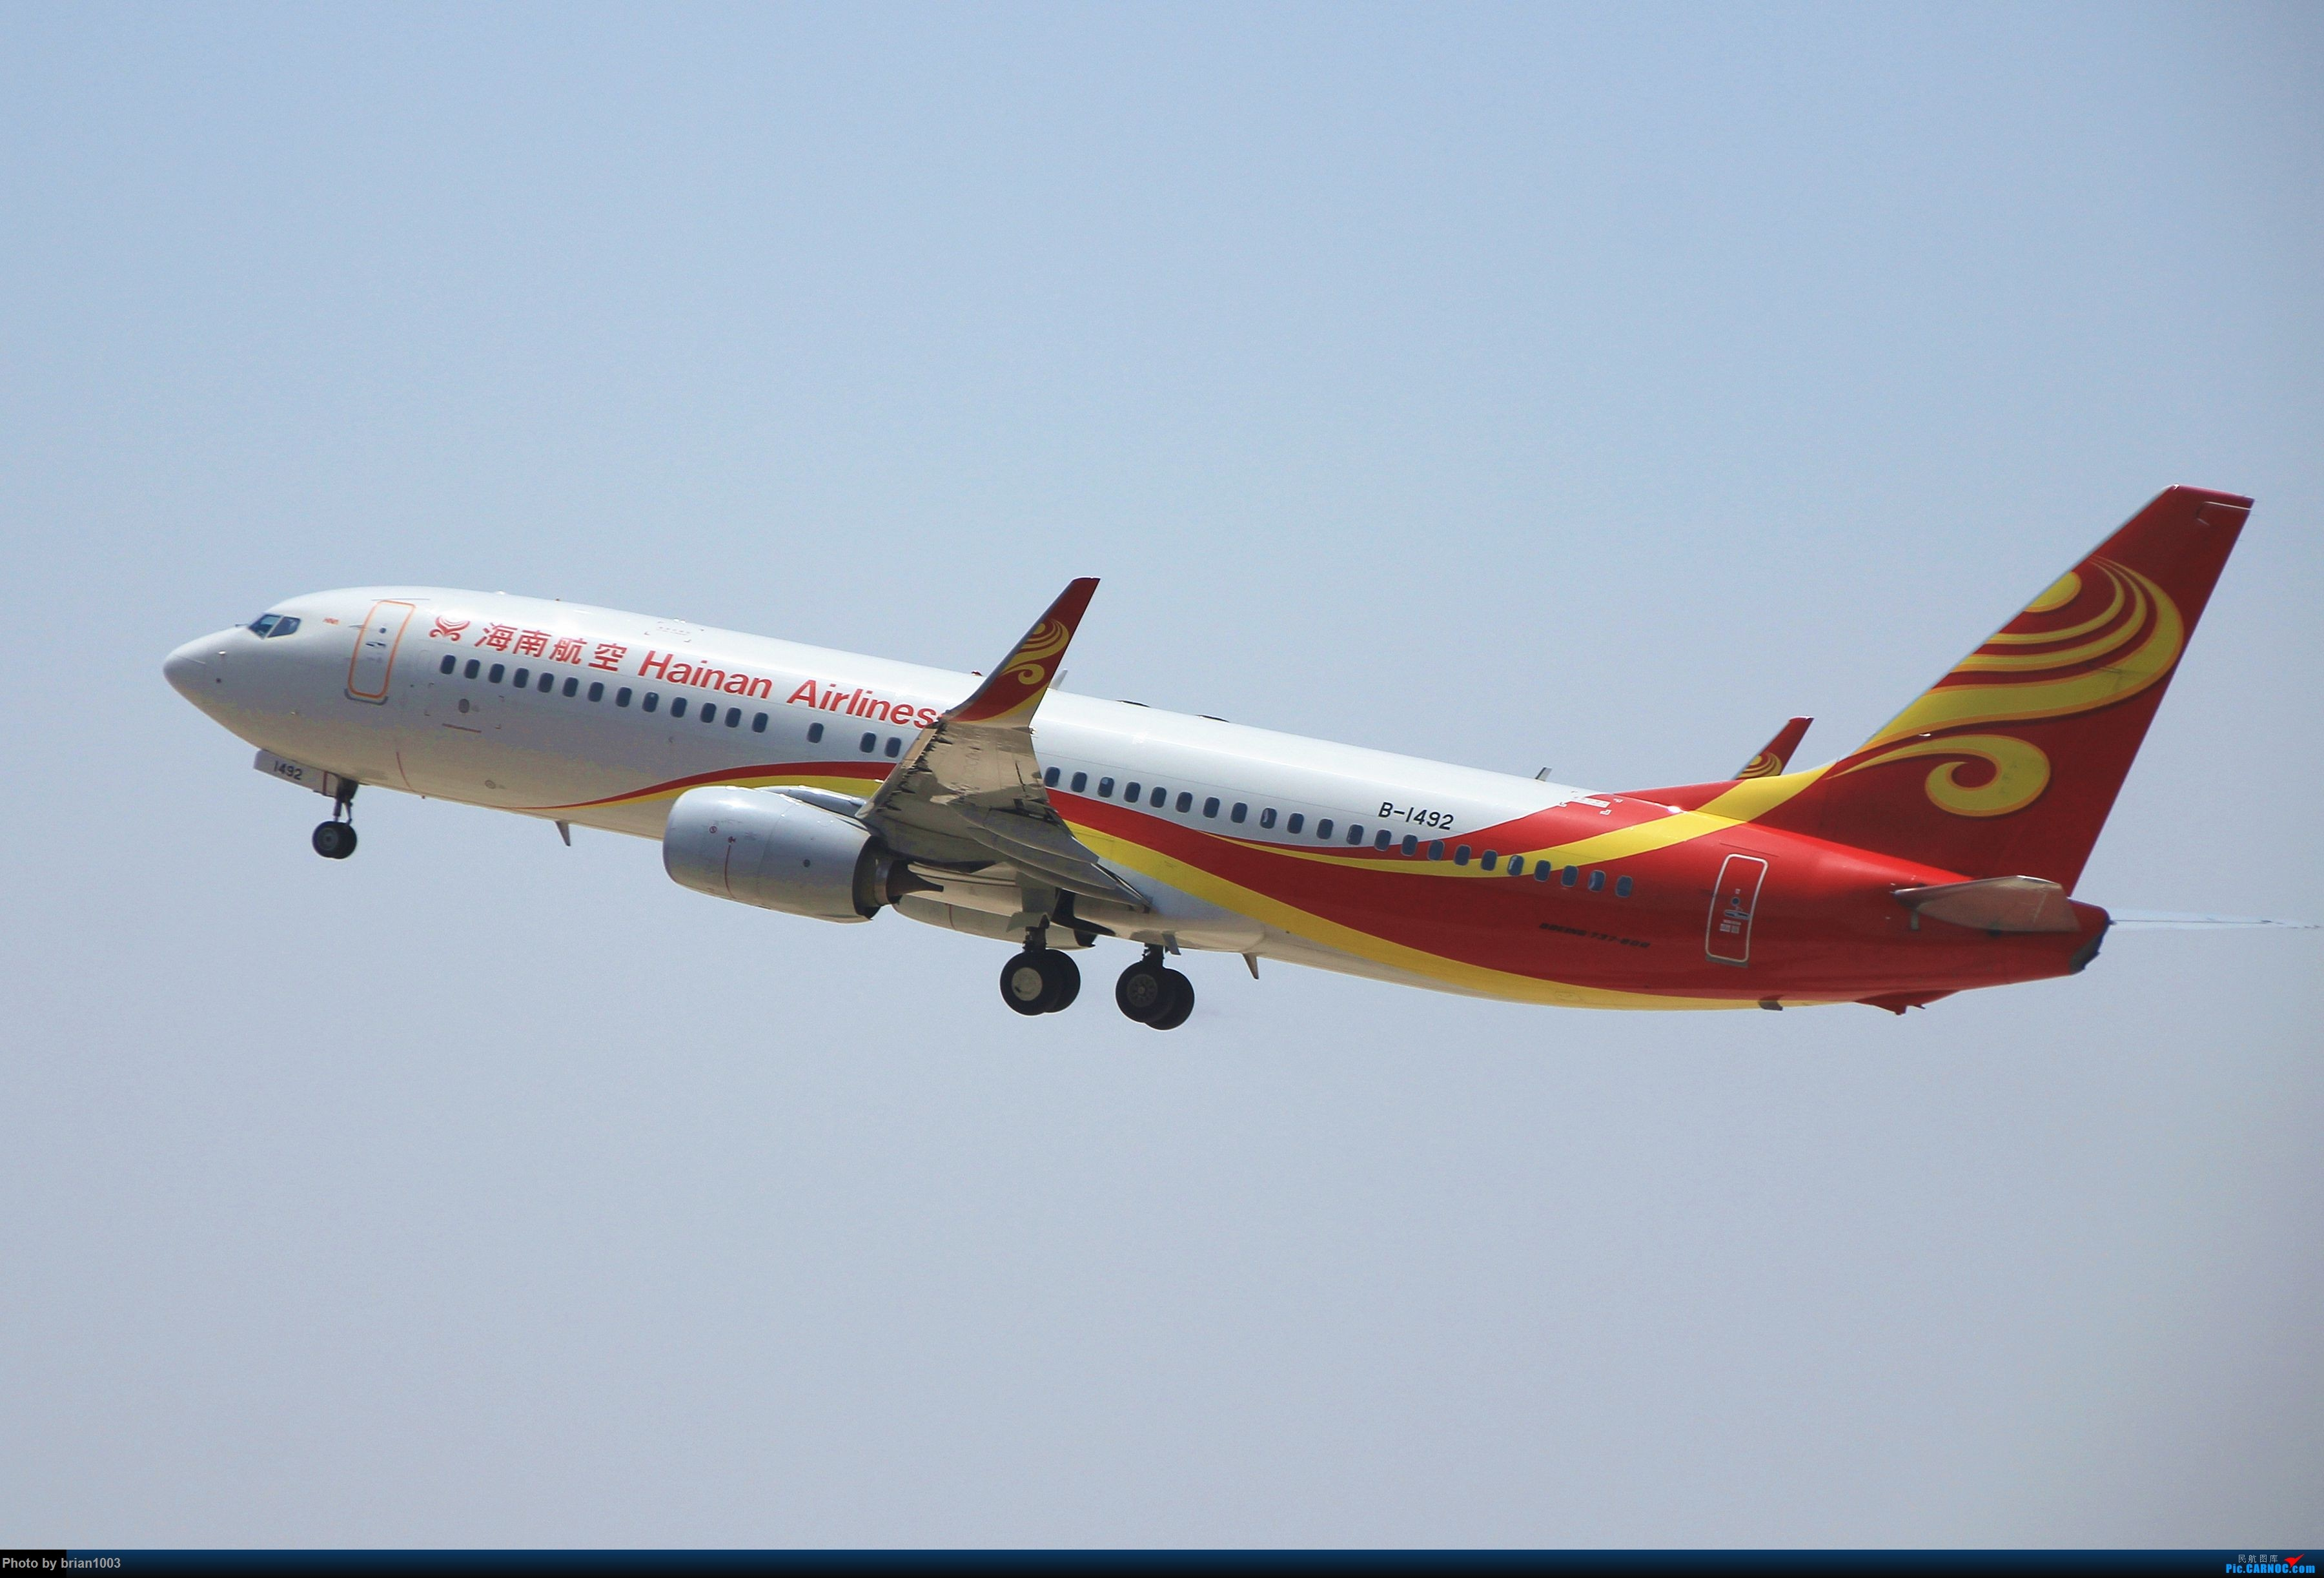 Re:[原创]WUH武汉天河机场拍机之喜迎酷航788和偶遇某其他飞机 BOEING 737-800 B-1492